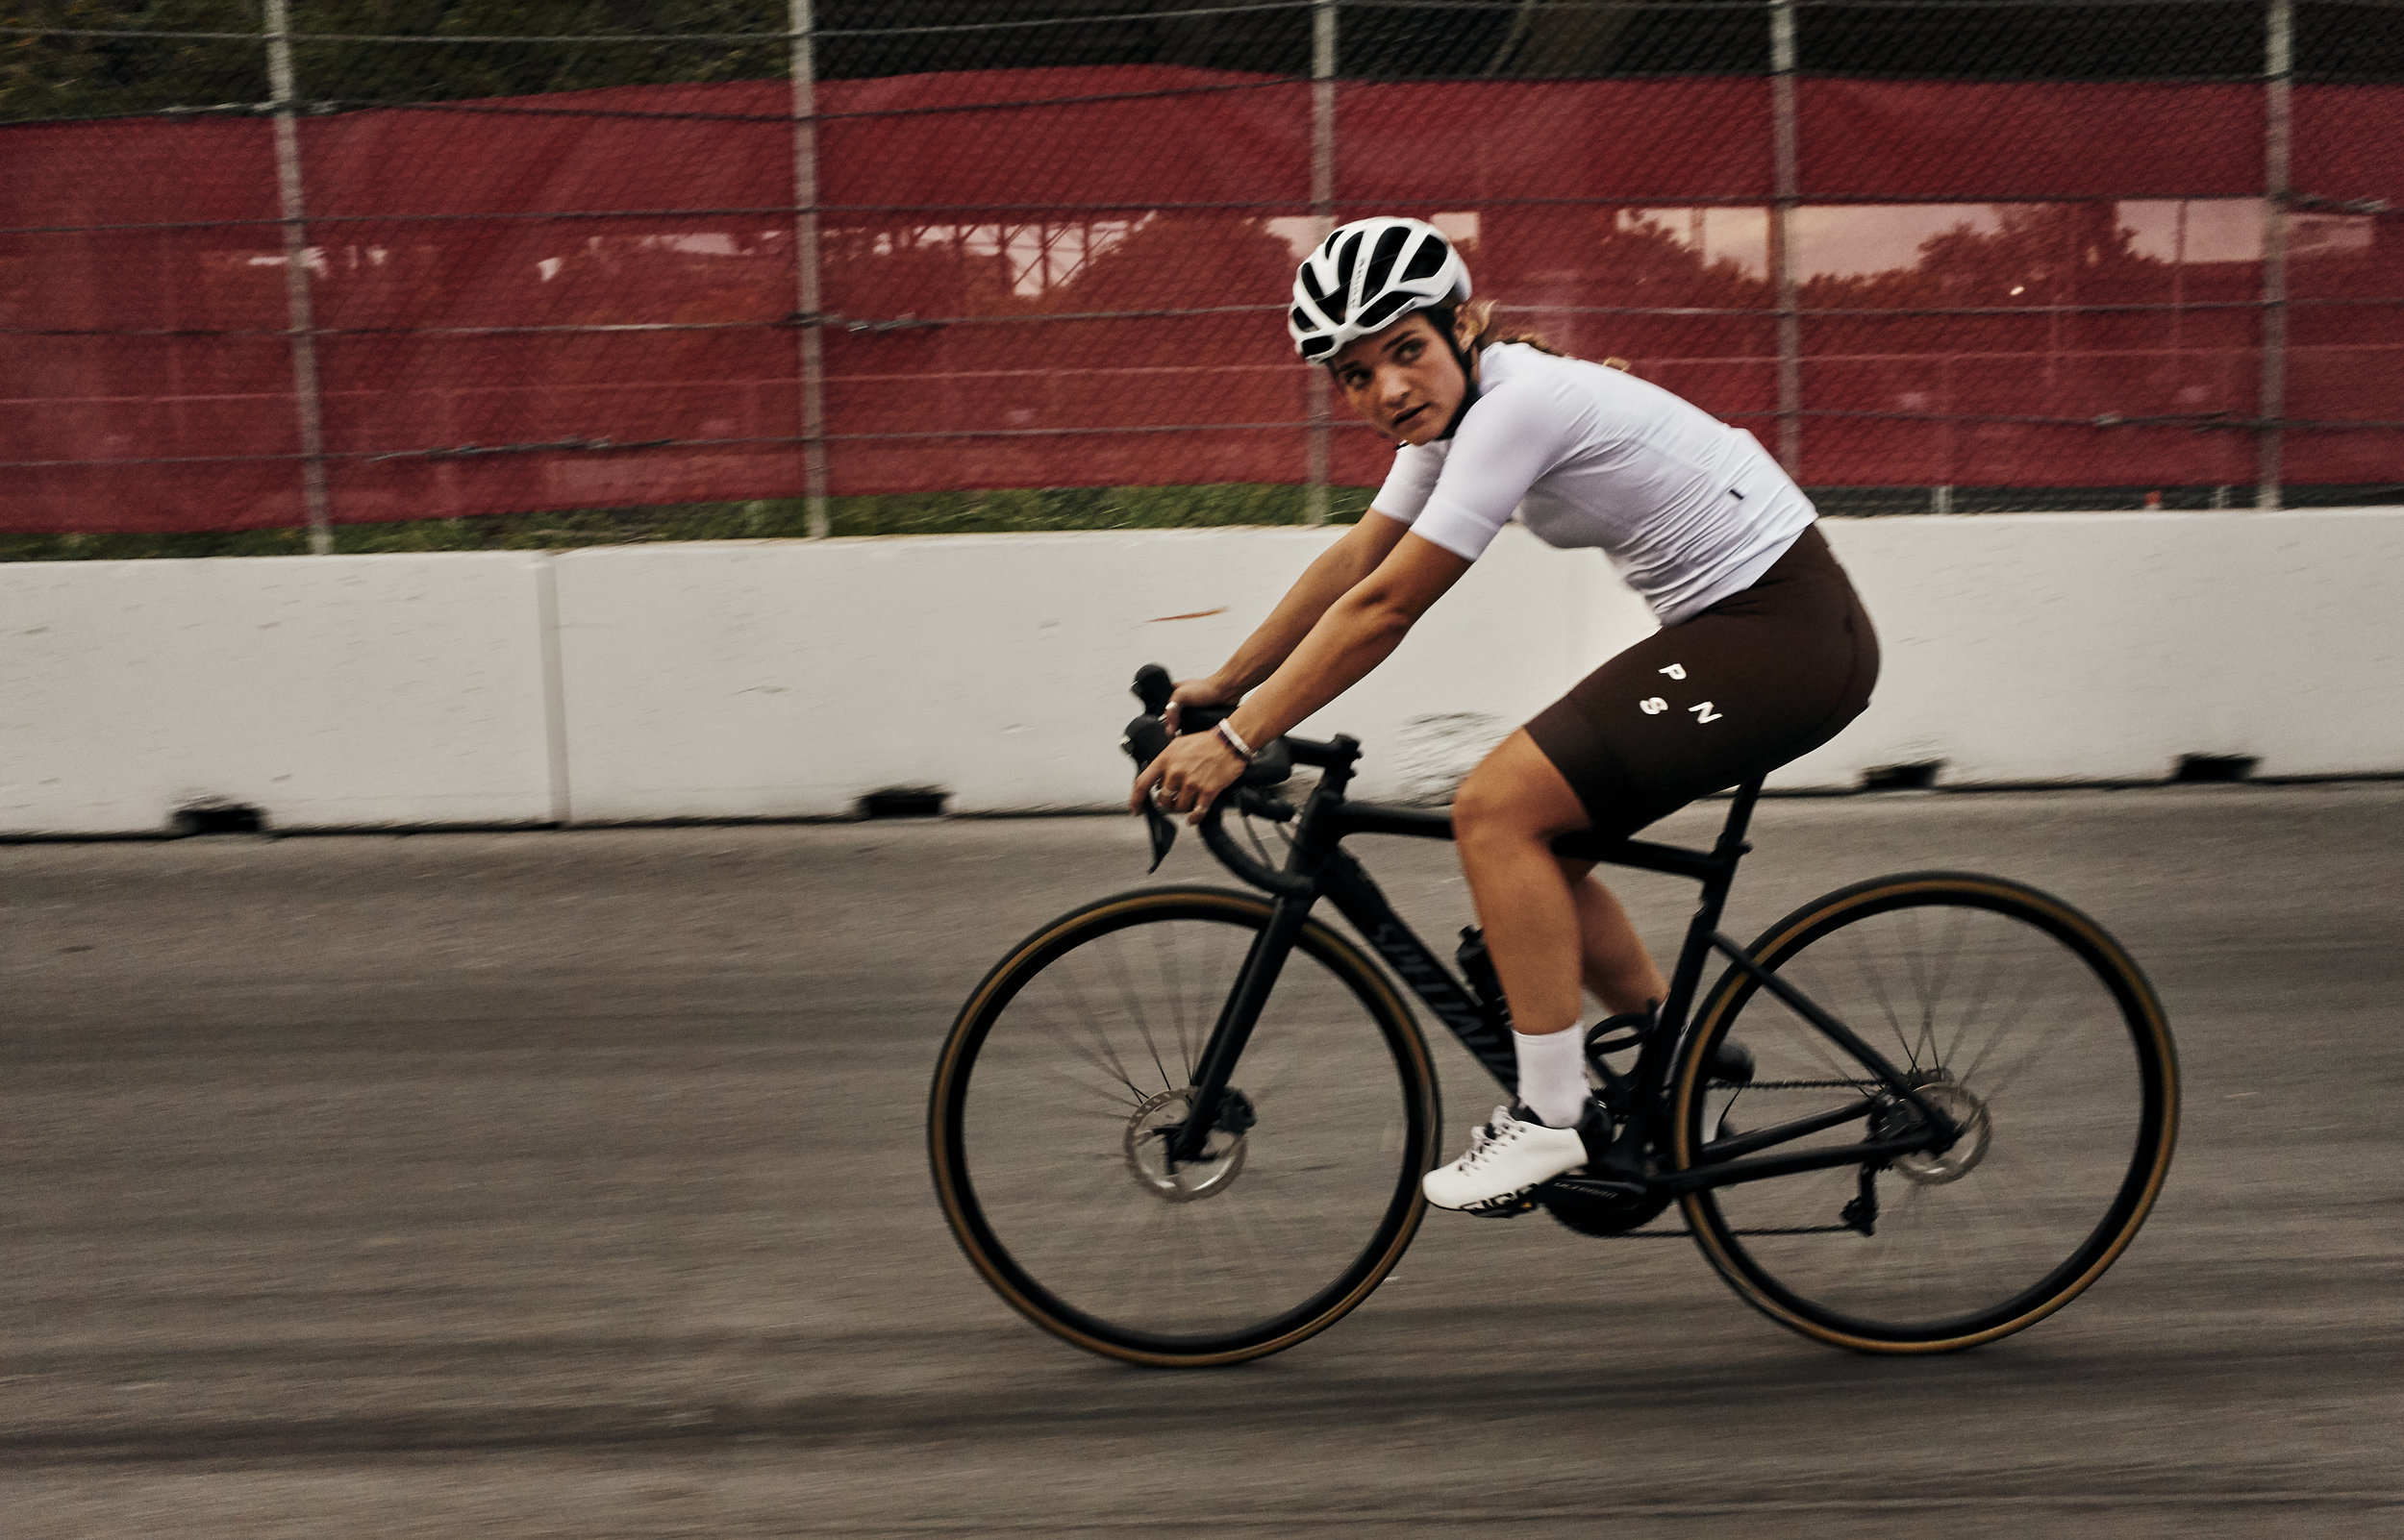 19GRII_Bike Images_0749.jpg